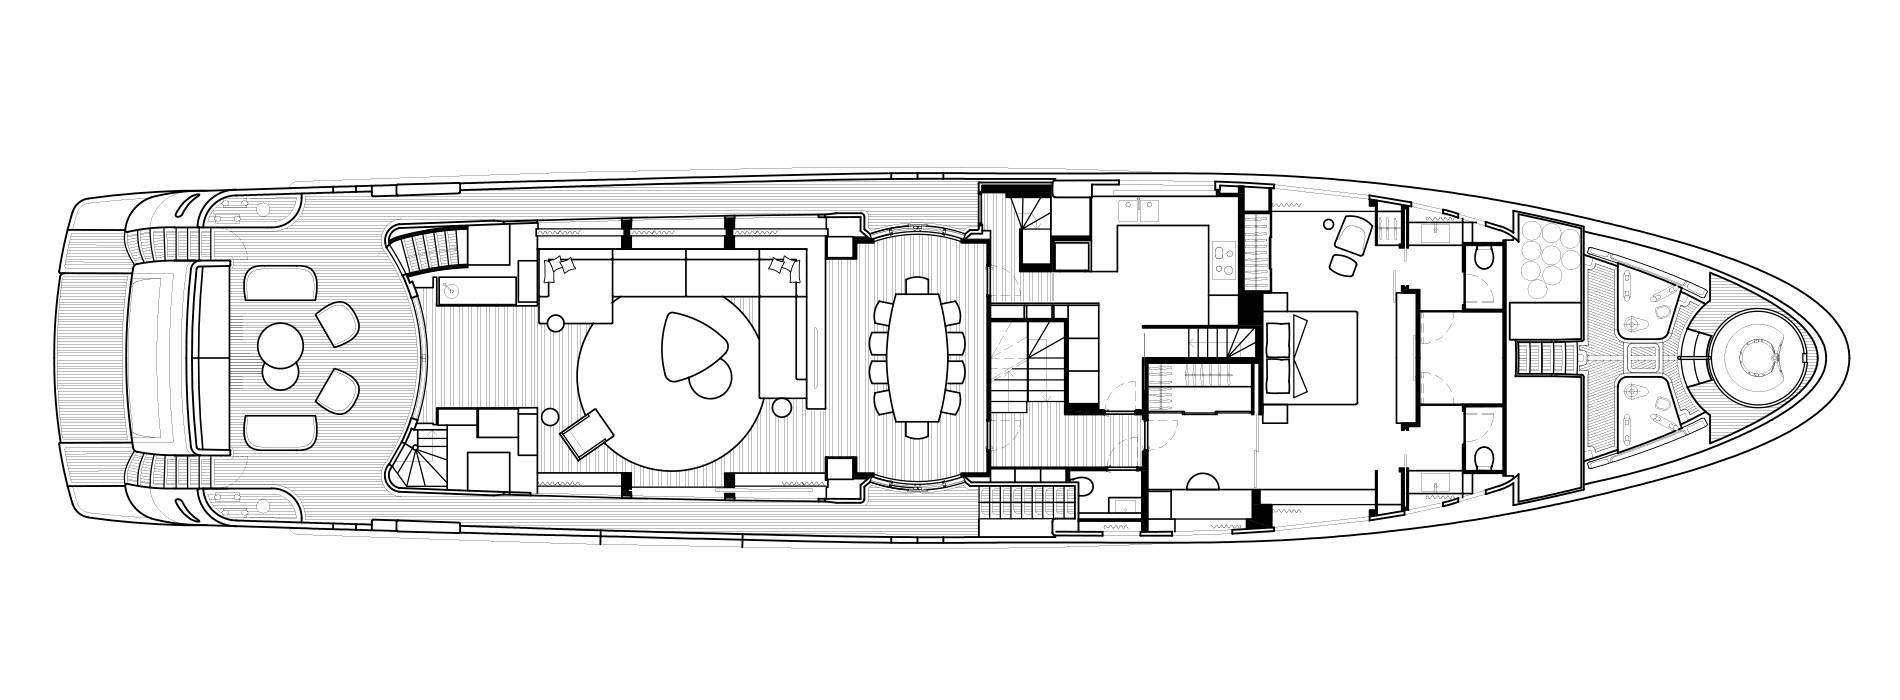 Sanlorenzo Yachts SD126 Hauptdeck